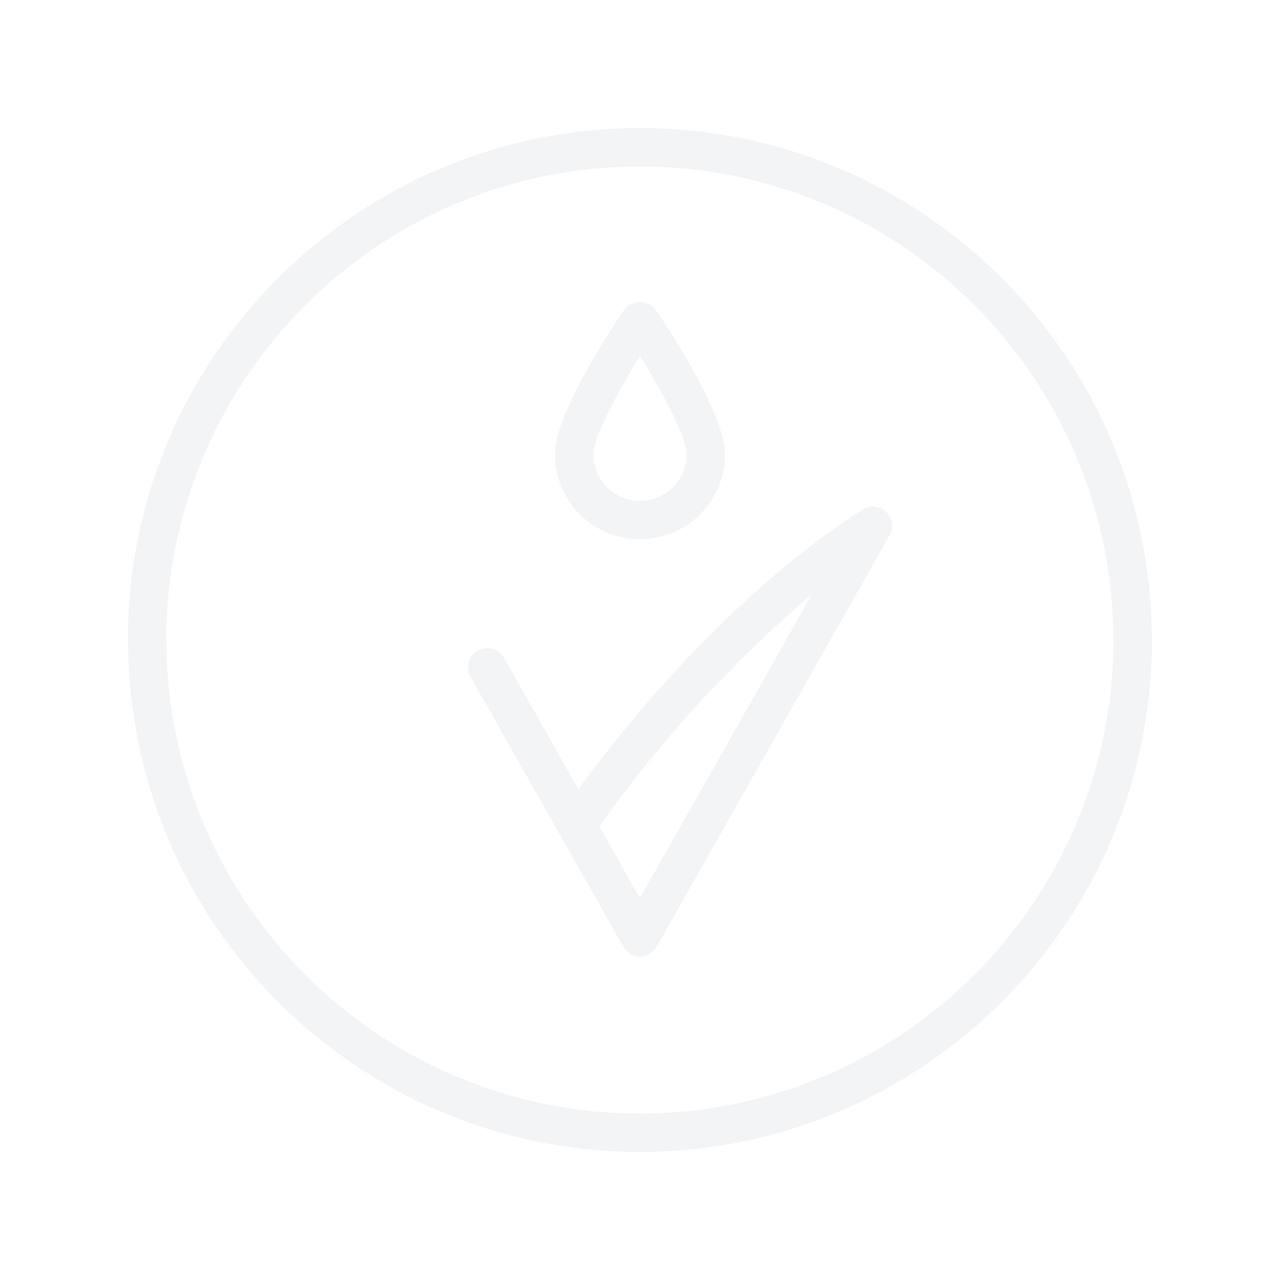 CALVIN KLEIN Women Body Lotion 200ml